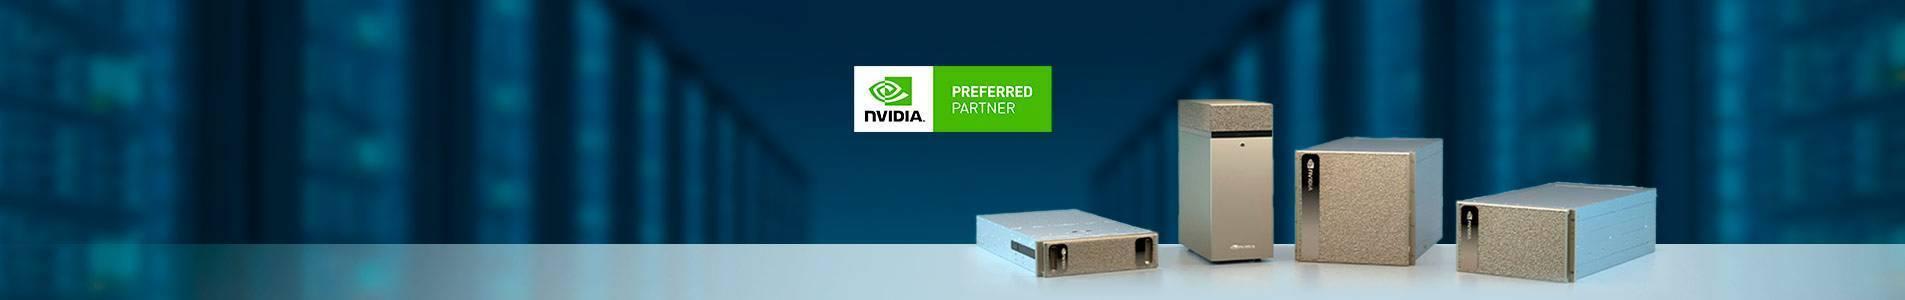 servers-gpu-nvidia-dgx-supermicro-gpu